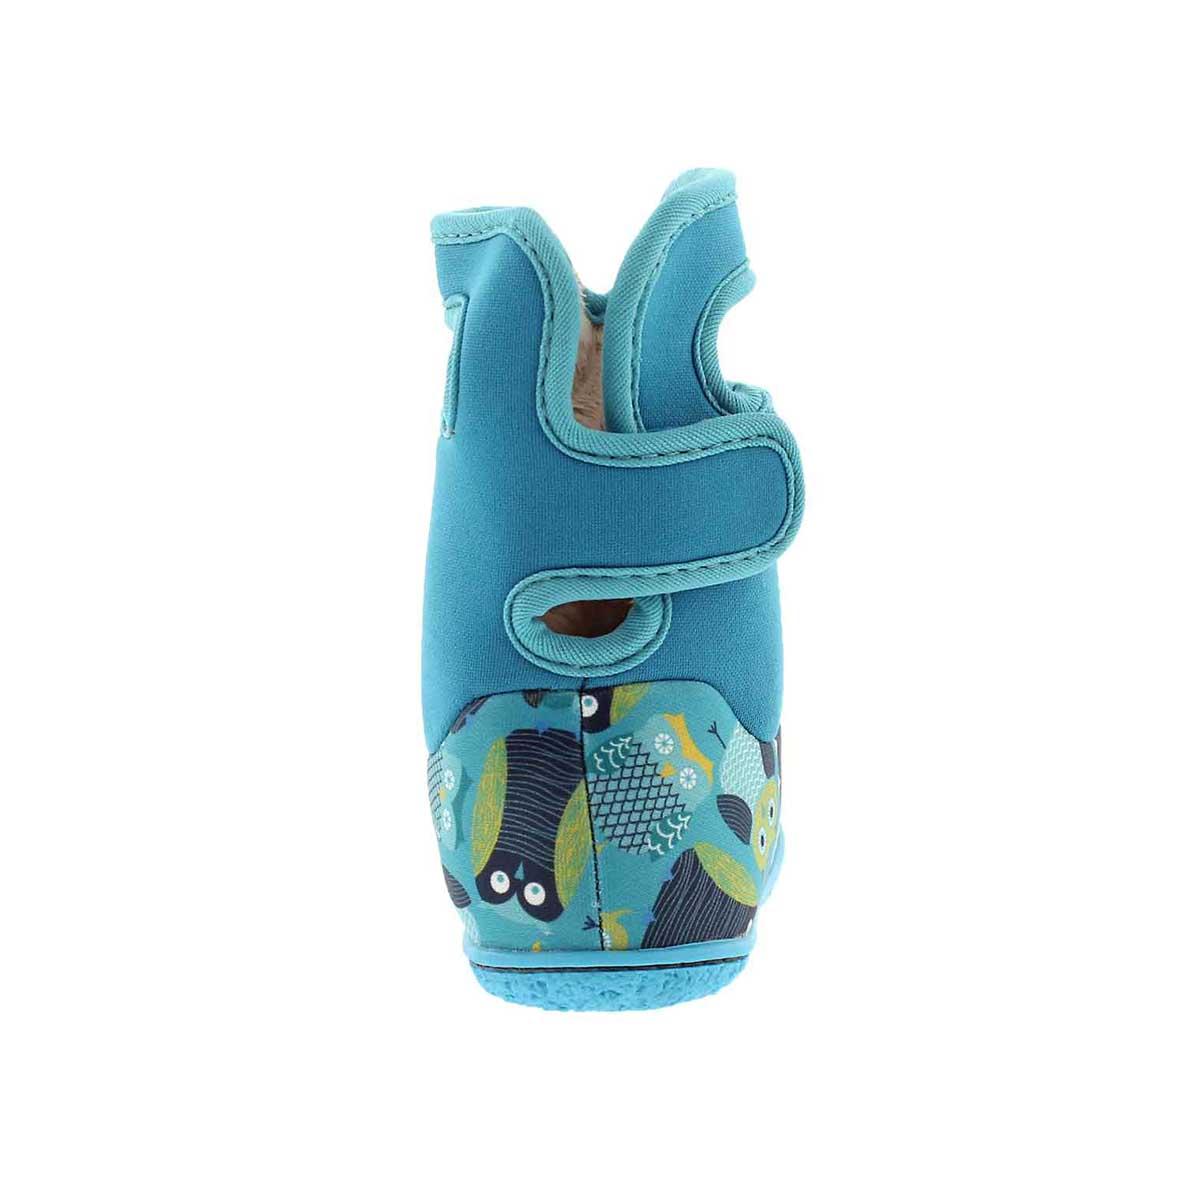 Inf-g Owls blue multi wtpf boot